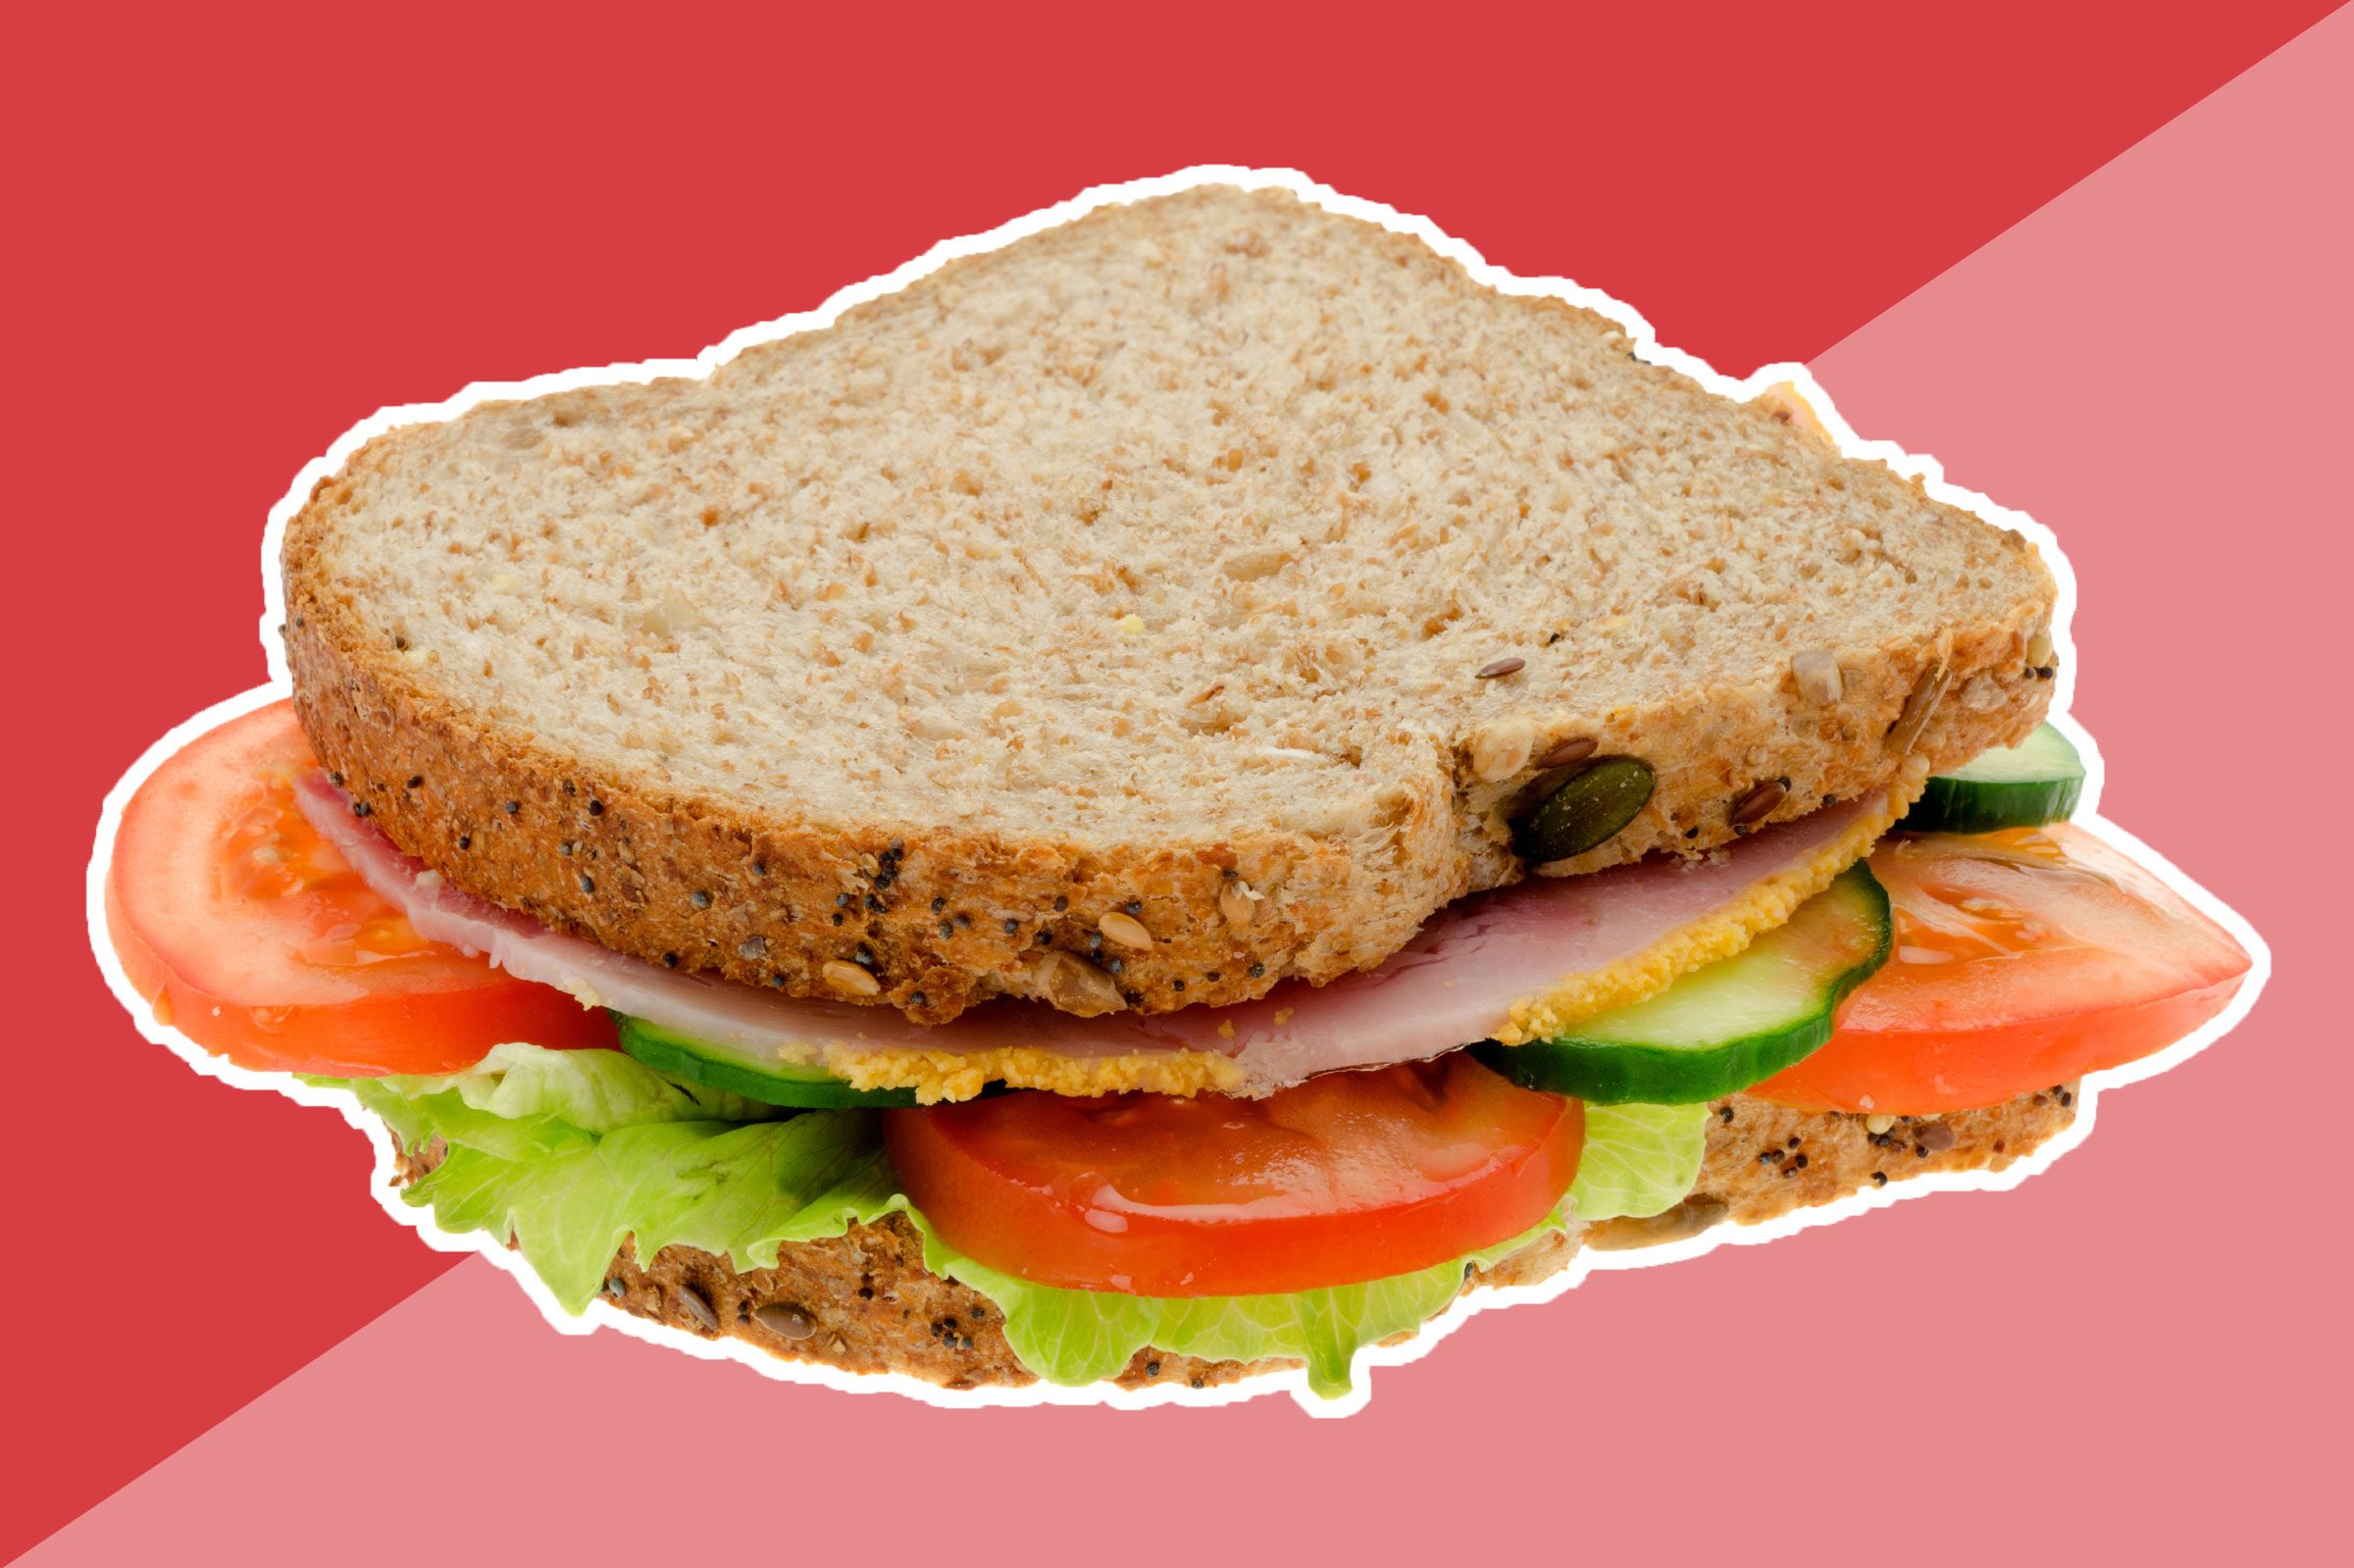 Microwave sandwiches